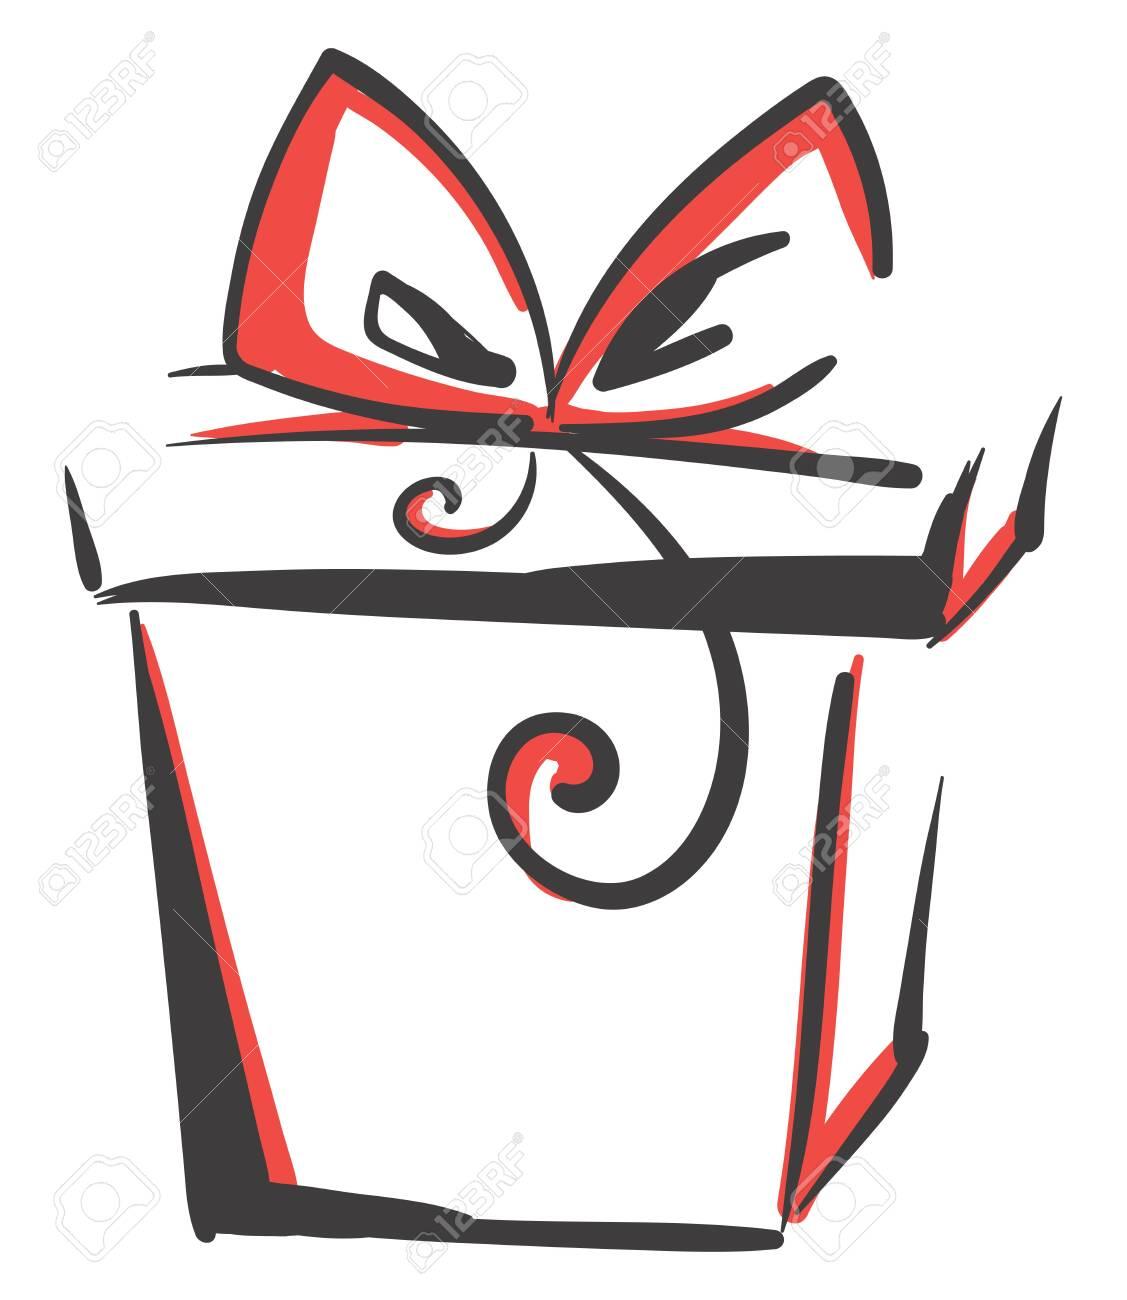 Drawing Of A Gift Box Vector Or Color Illustration Royalty Free Klipartlar Vektor Cizimler Ve Stok Cizim Image 123411507